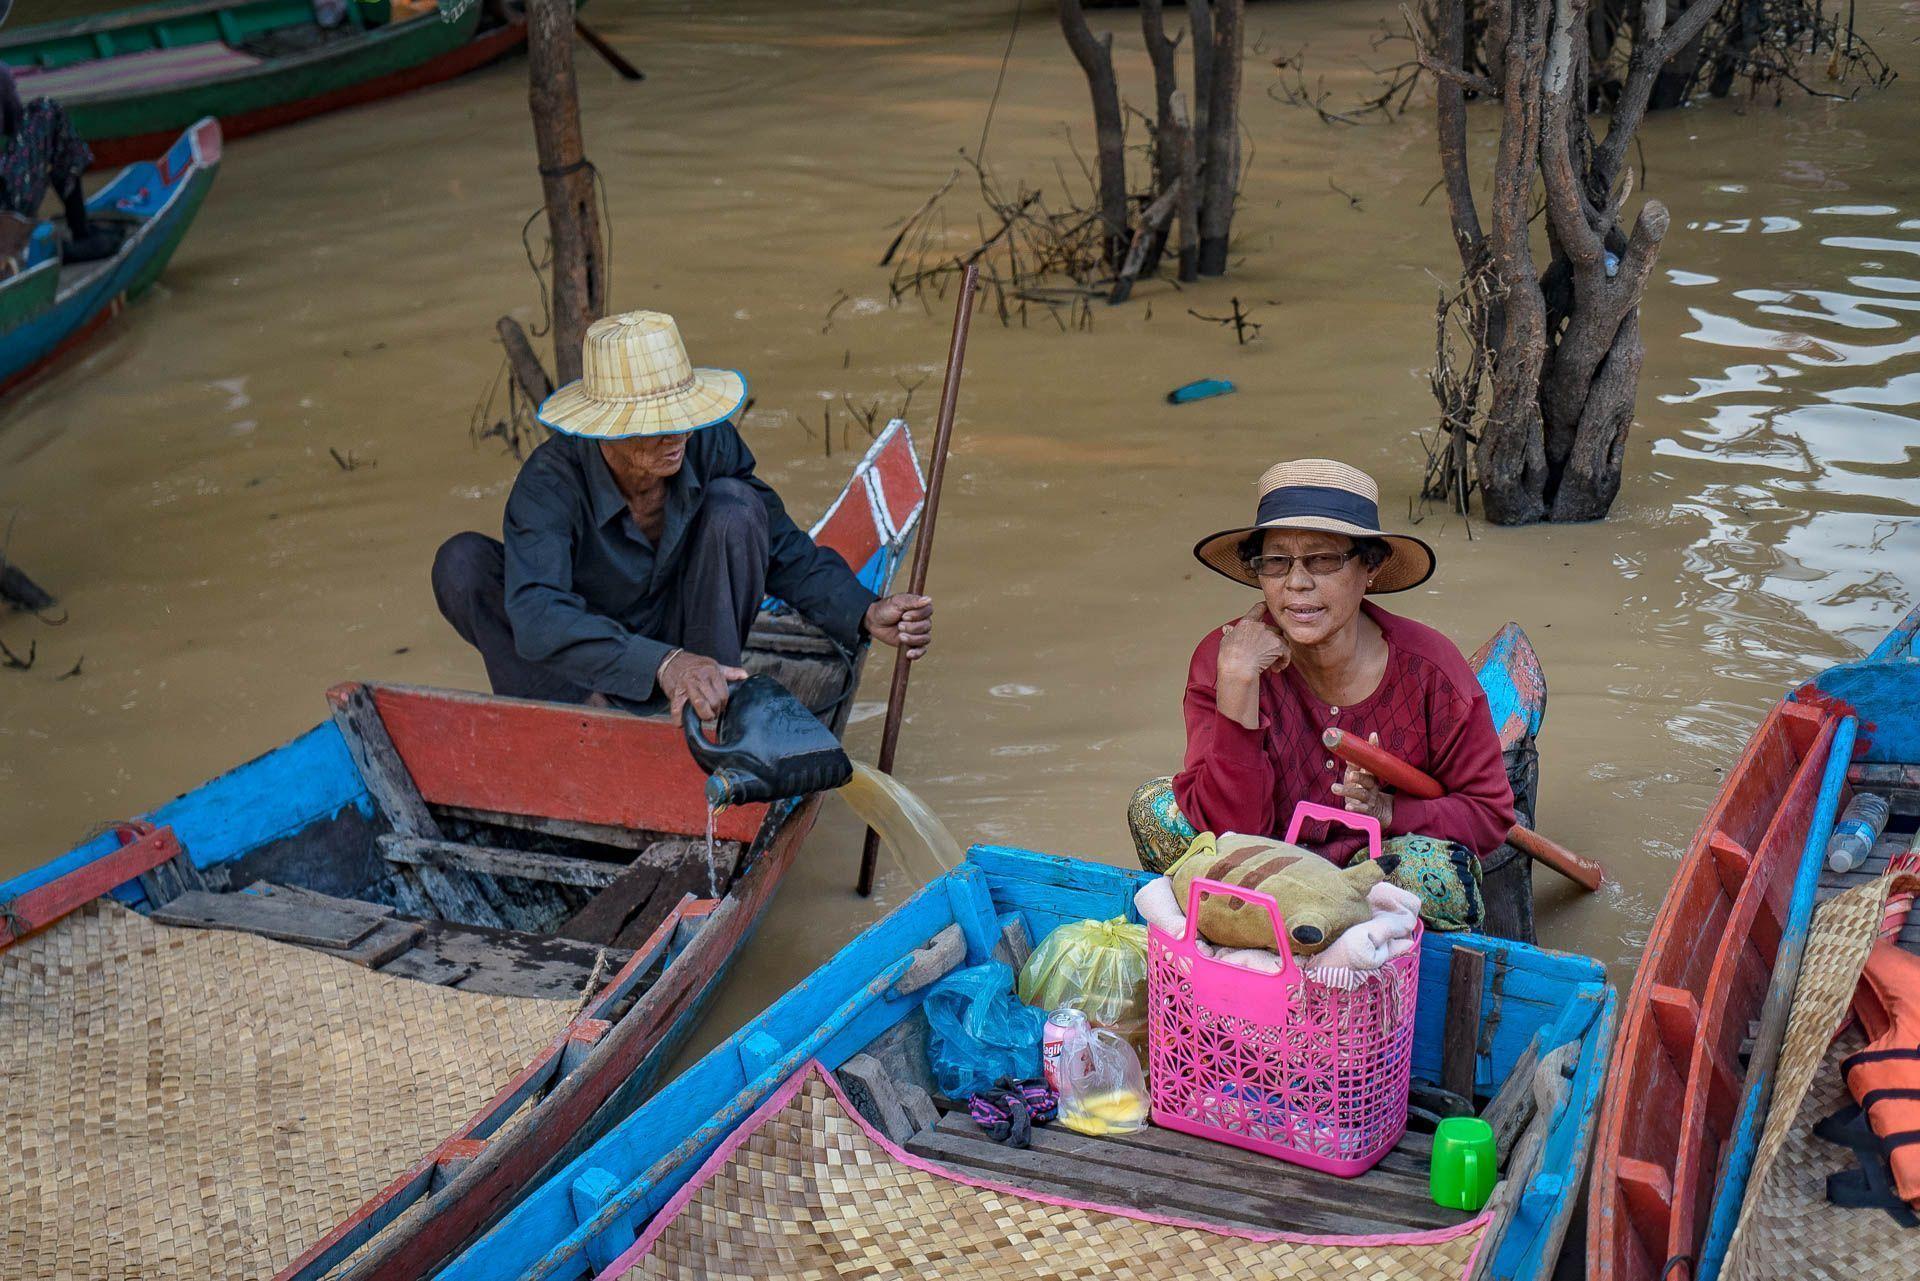 Lesvoyageuses-guide-voyage-siem-reap-angkor-cambodge-lavender-jeep-13